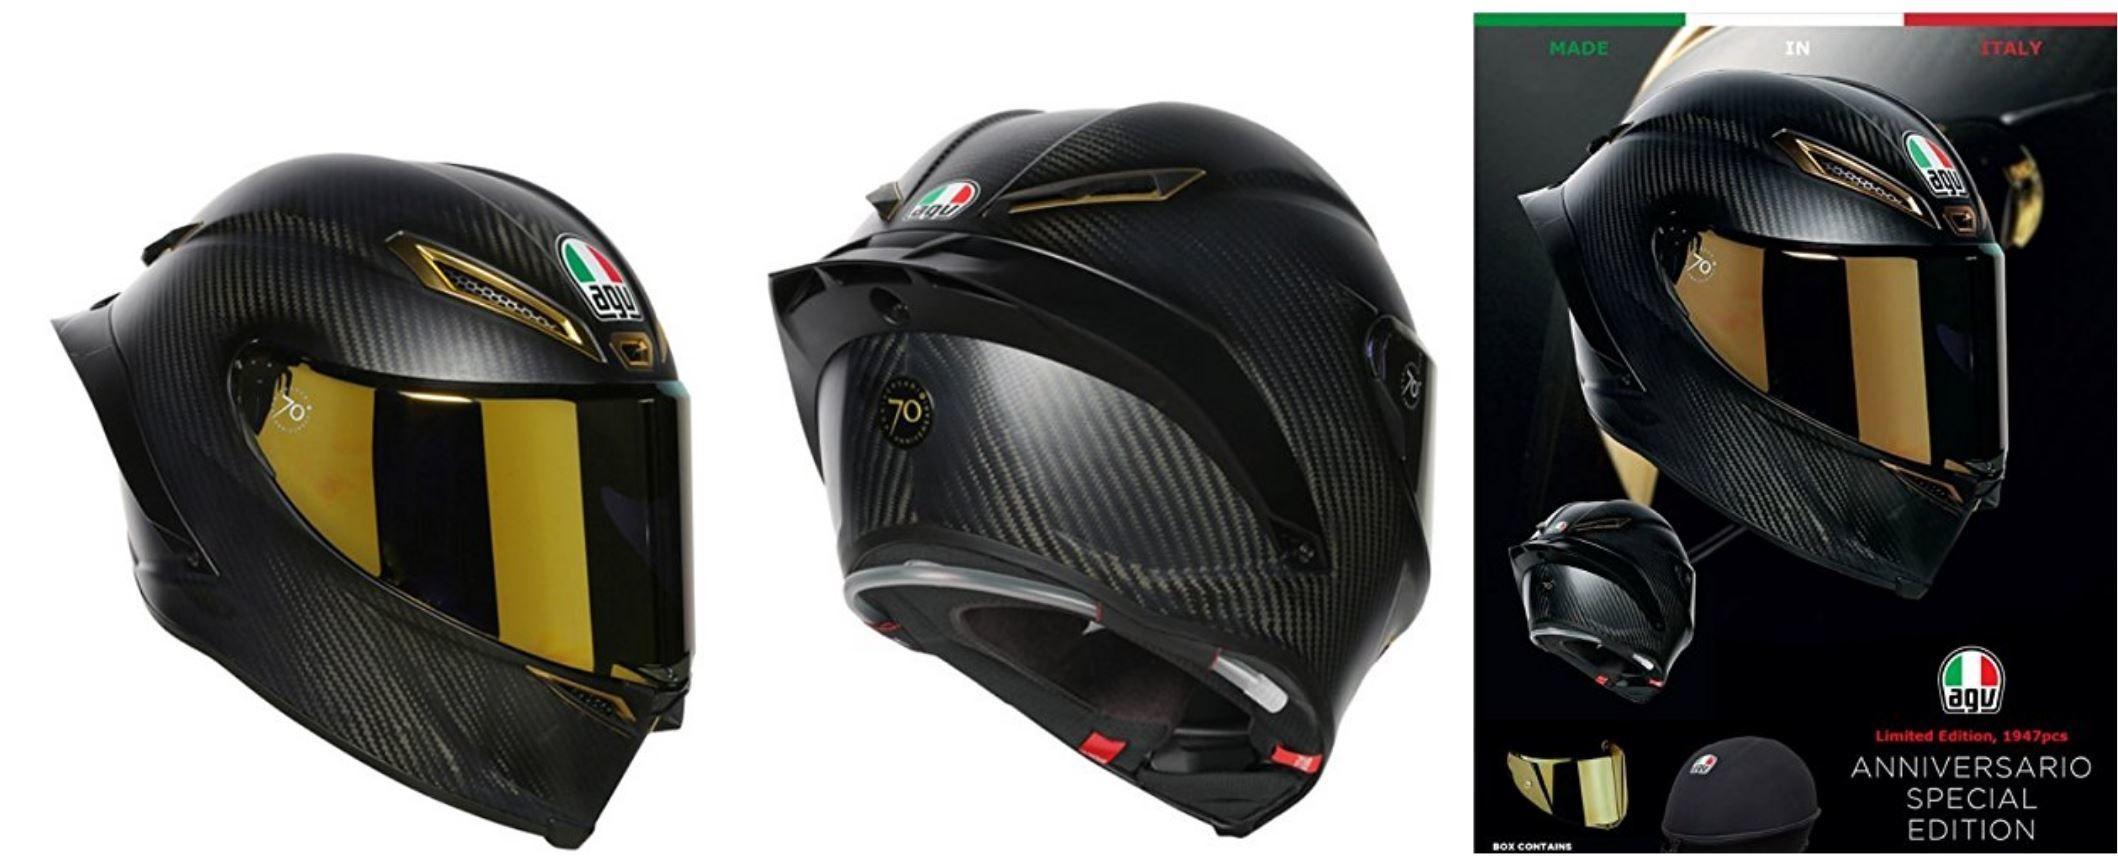 63246c51 Biker Dope- AGV Pista GP R Carbon Anniversario Helmet | M A G - A ...